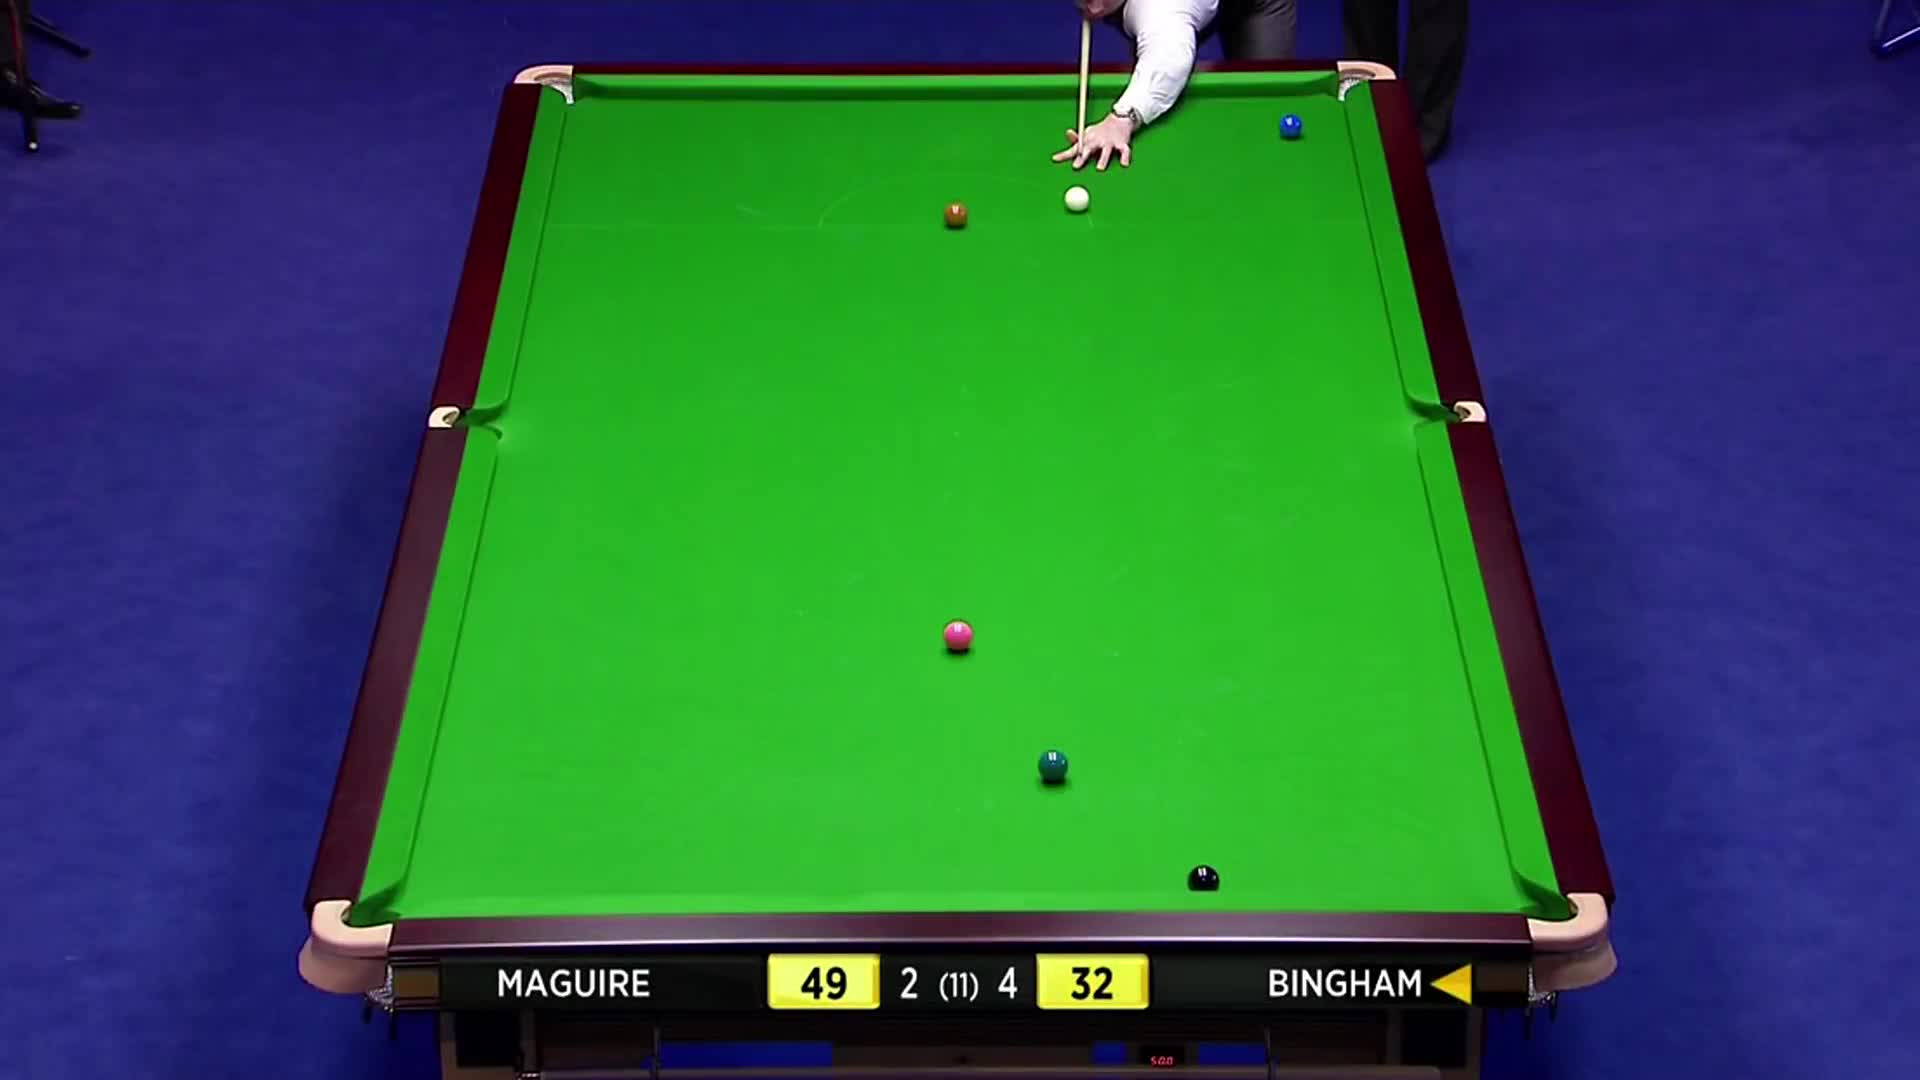 Snooker, Suart Bingham,  GIFs